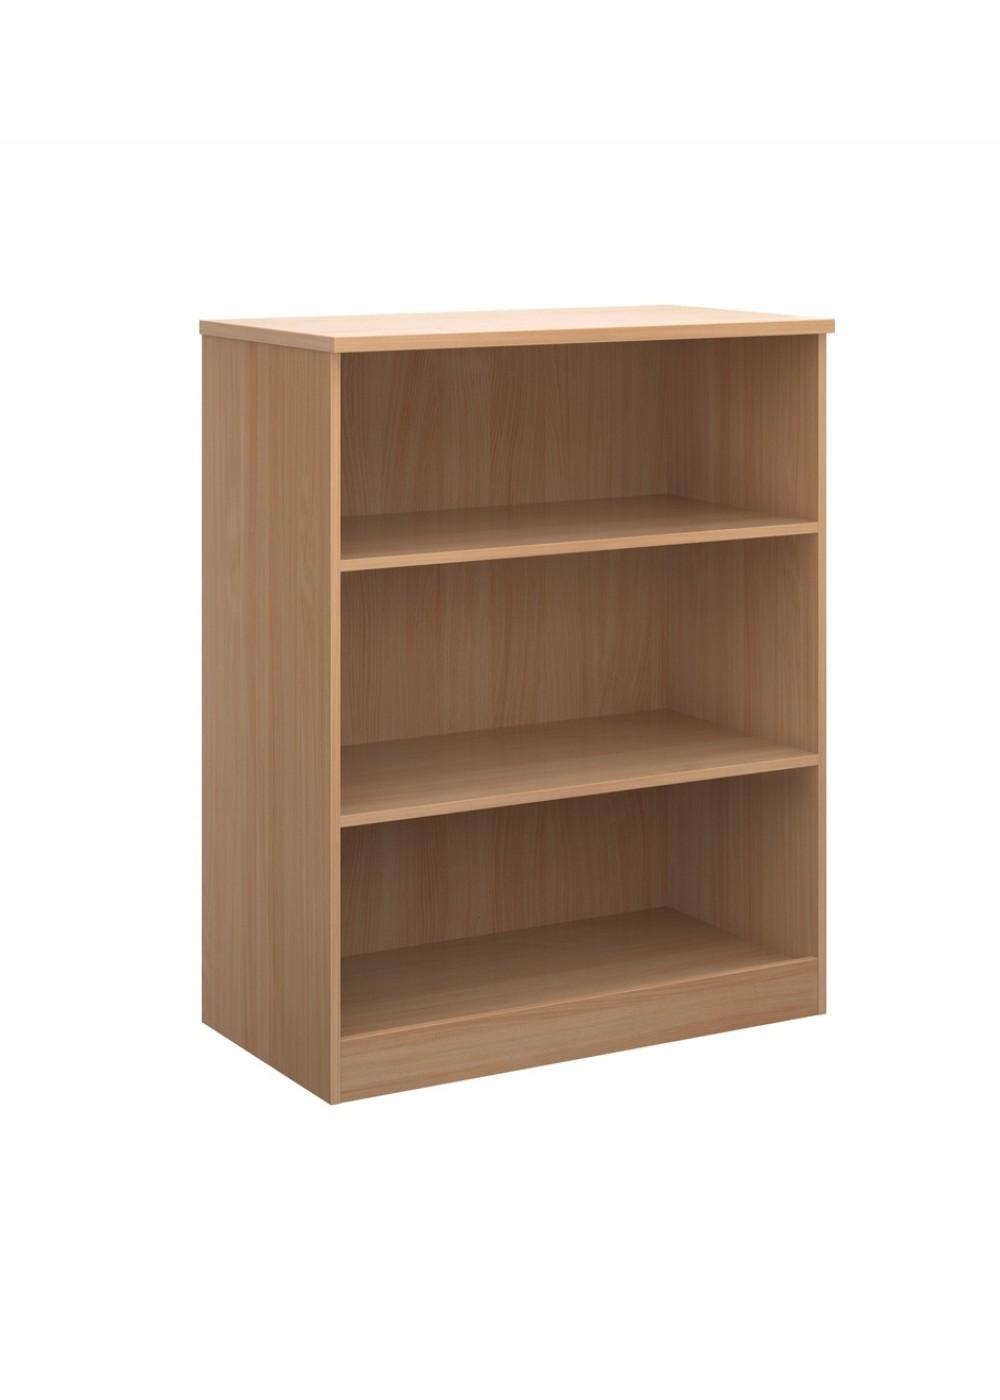 deluxe bookcase bc12 121 office furniture. Black Bedroom Furniture Sets. Home Design Ideas